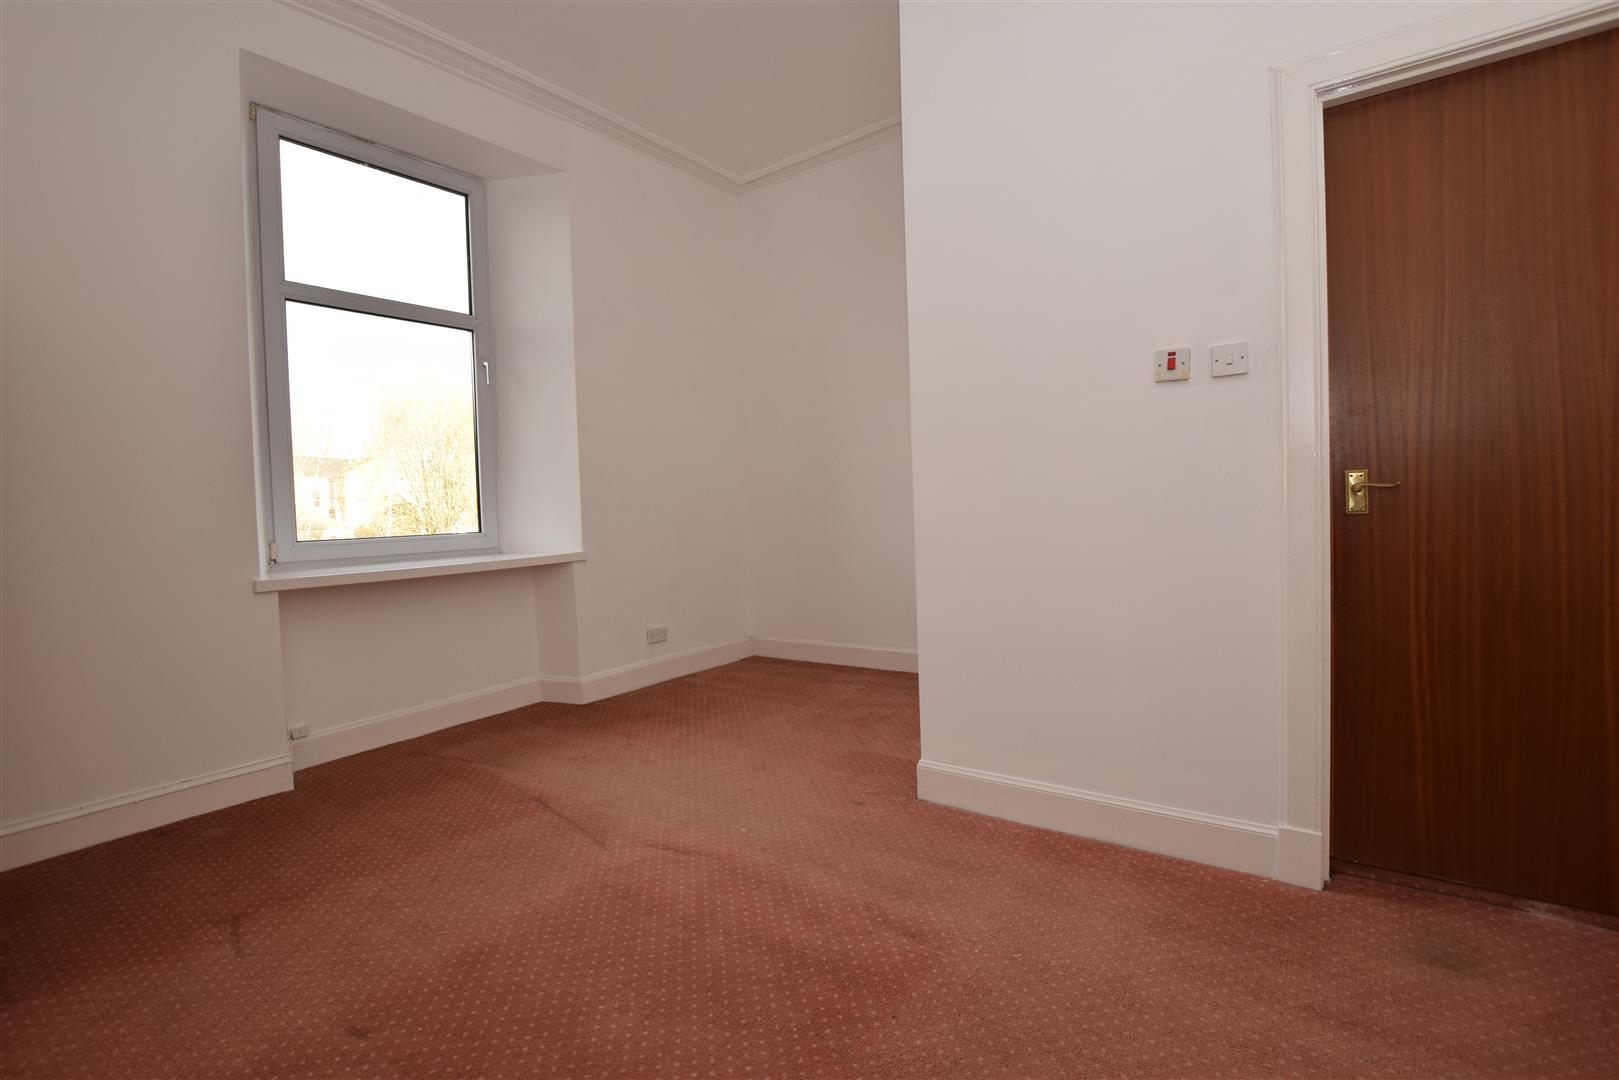 6, Marshall Place, Perth, Perthshire, PH2 8AH, UK